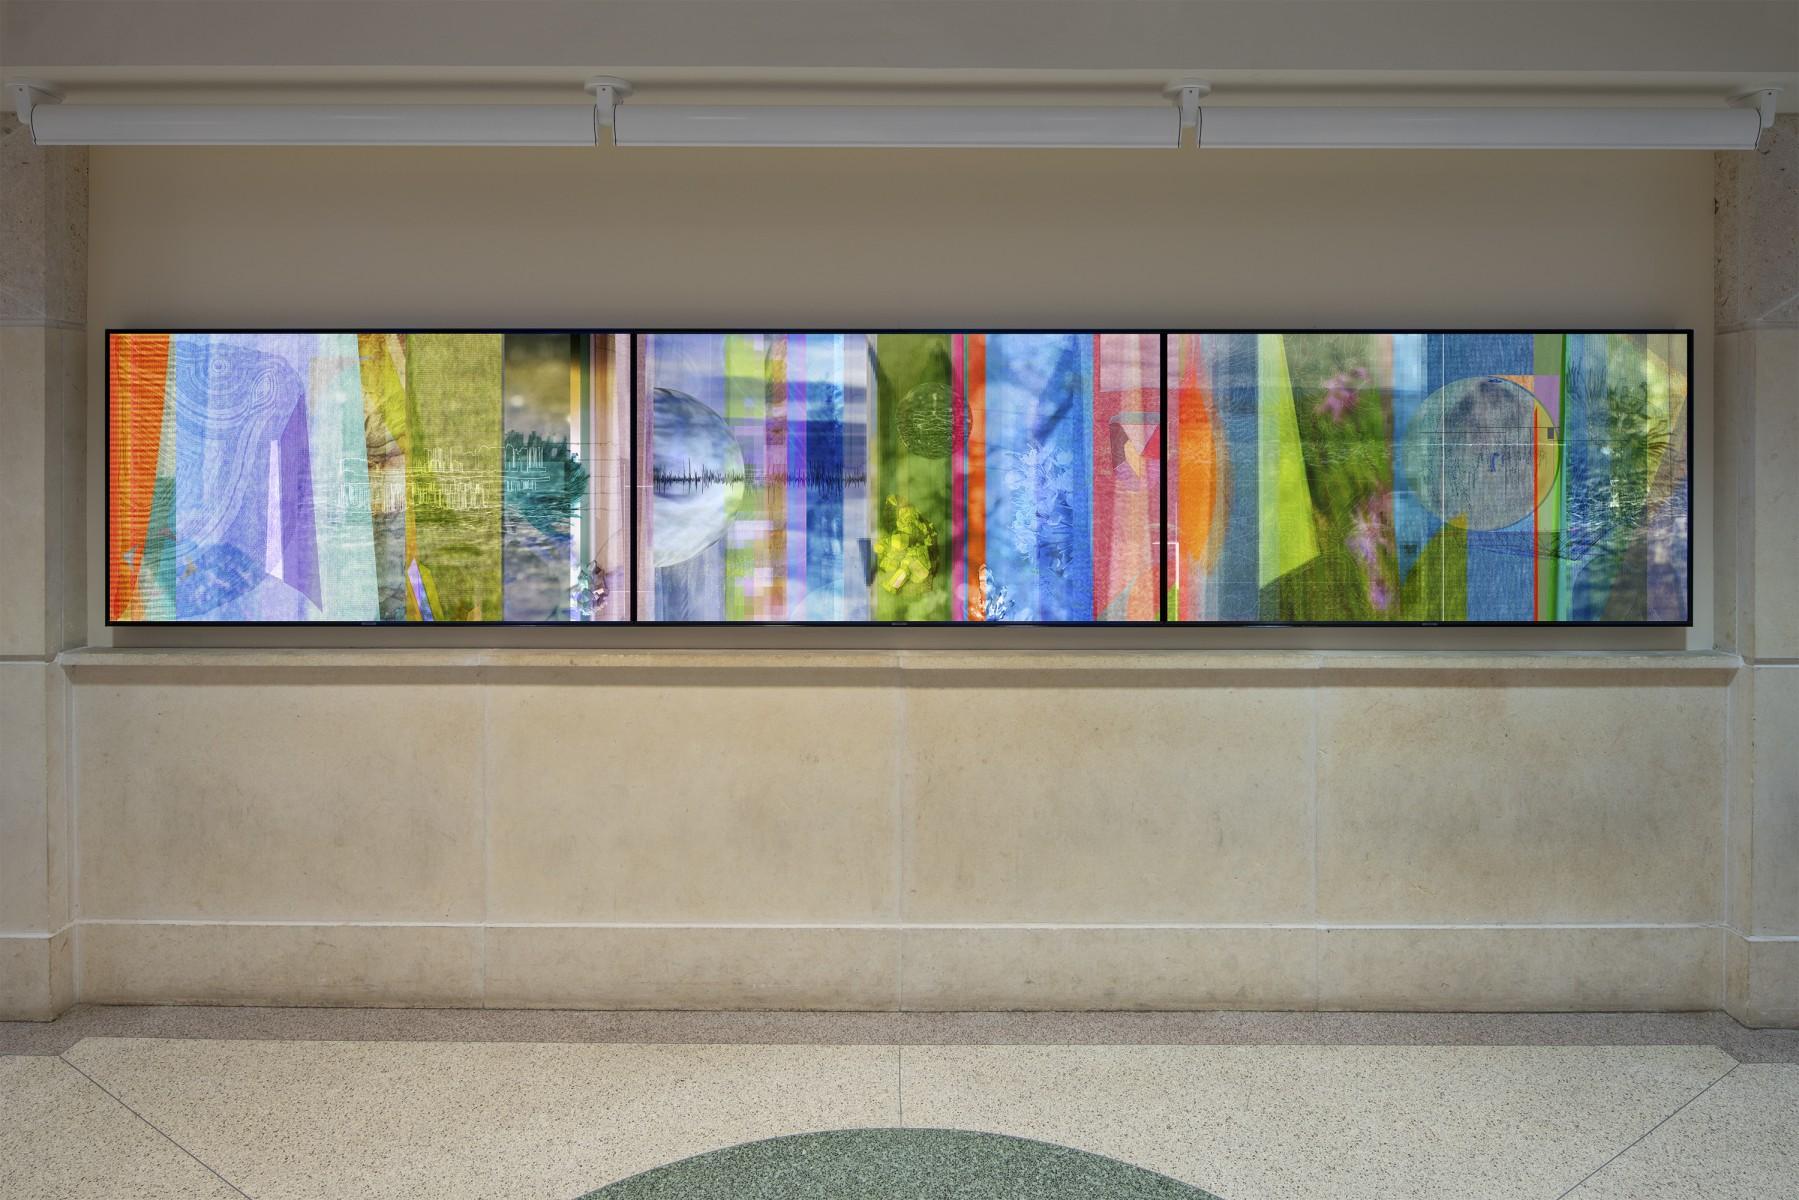 University of Texas Landmarks - Represents 7 mbravo dsc 9982c c lres?itok=OTuBca3O